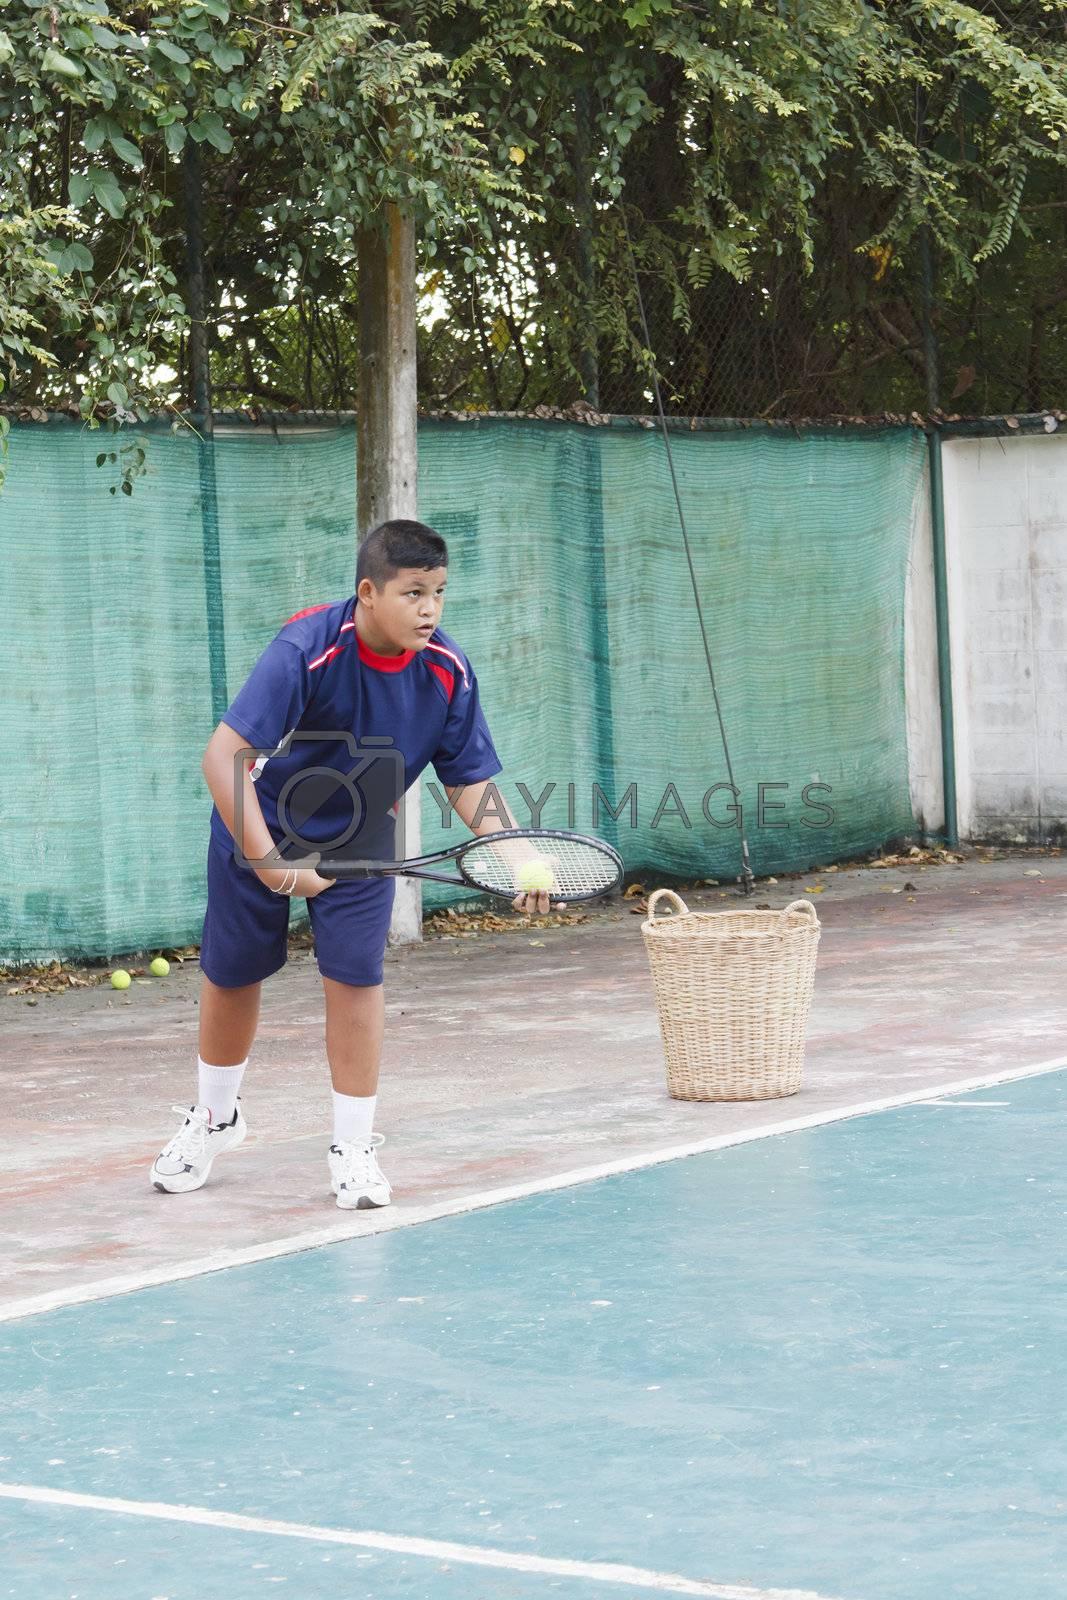 Thai boy tennis practicing